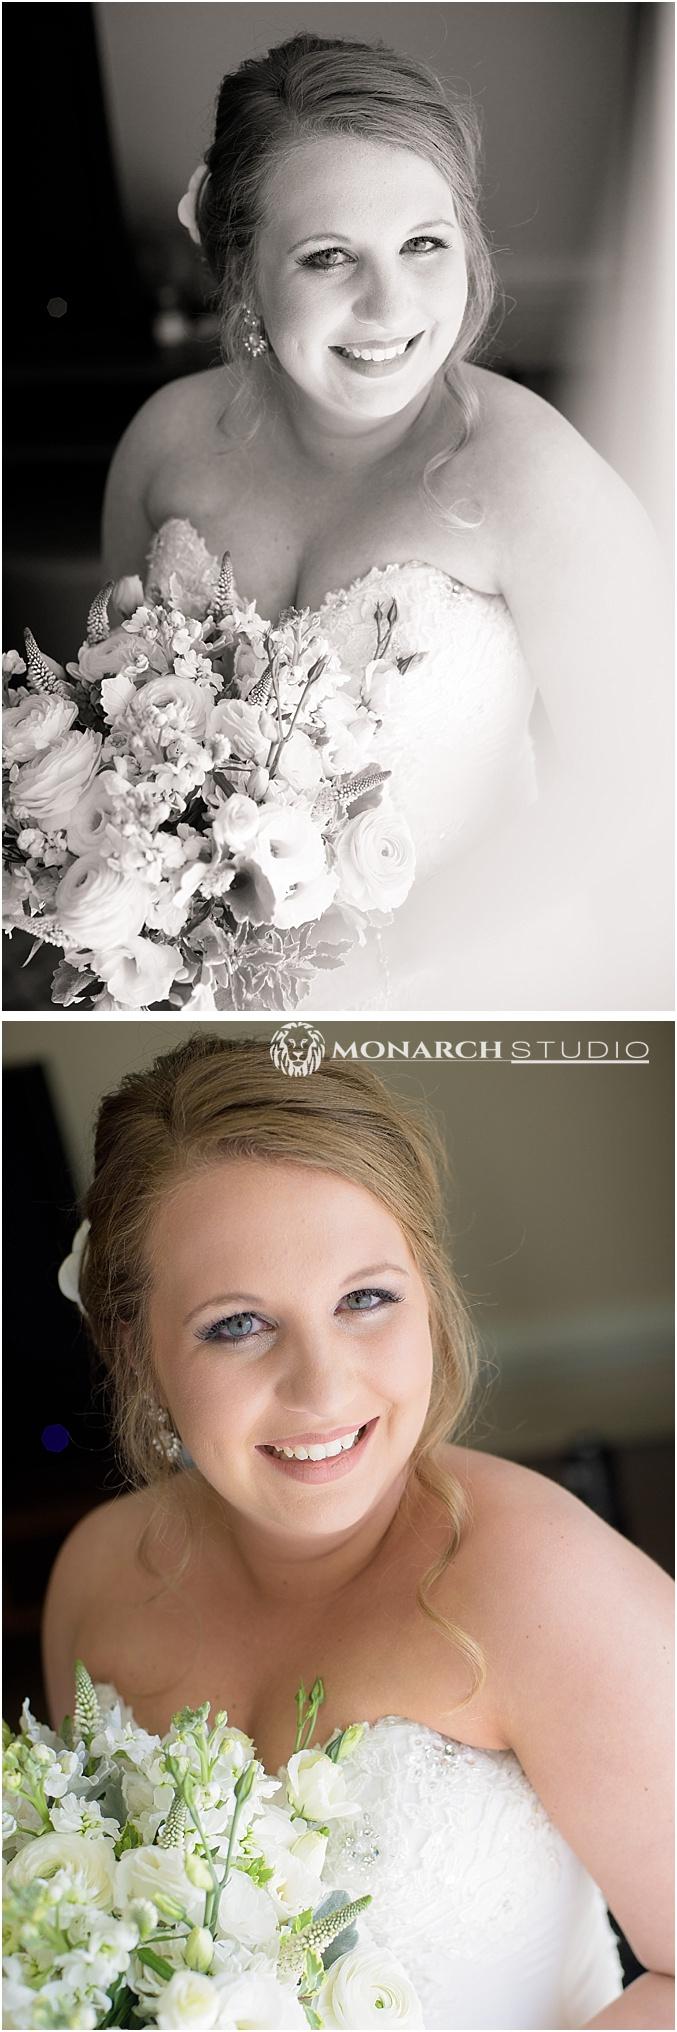 williamsburg-virginia-wedding-photographer-019.jpg